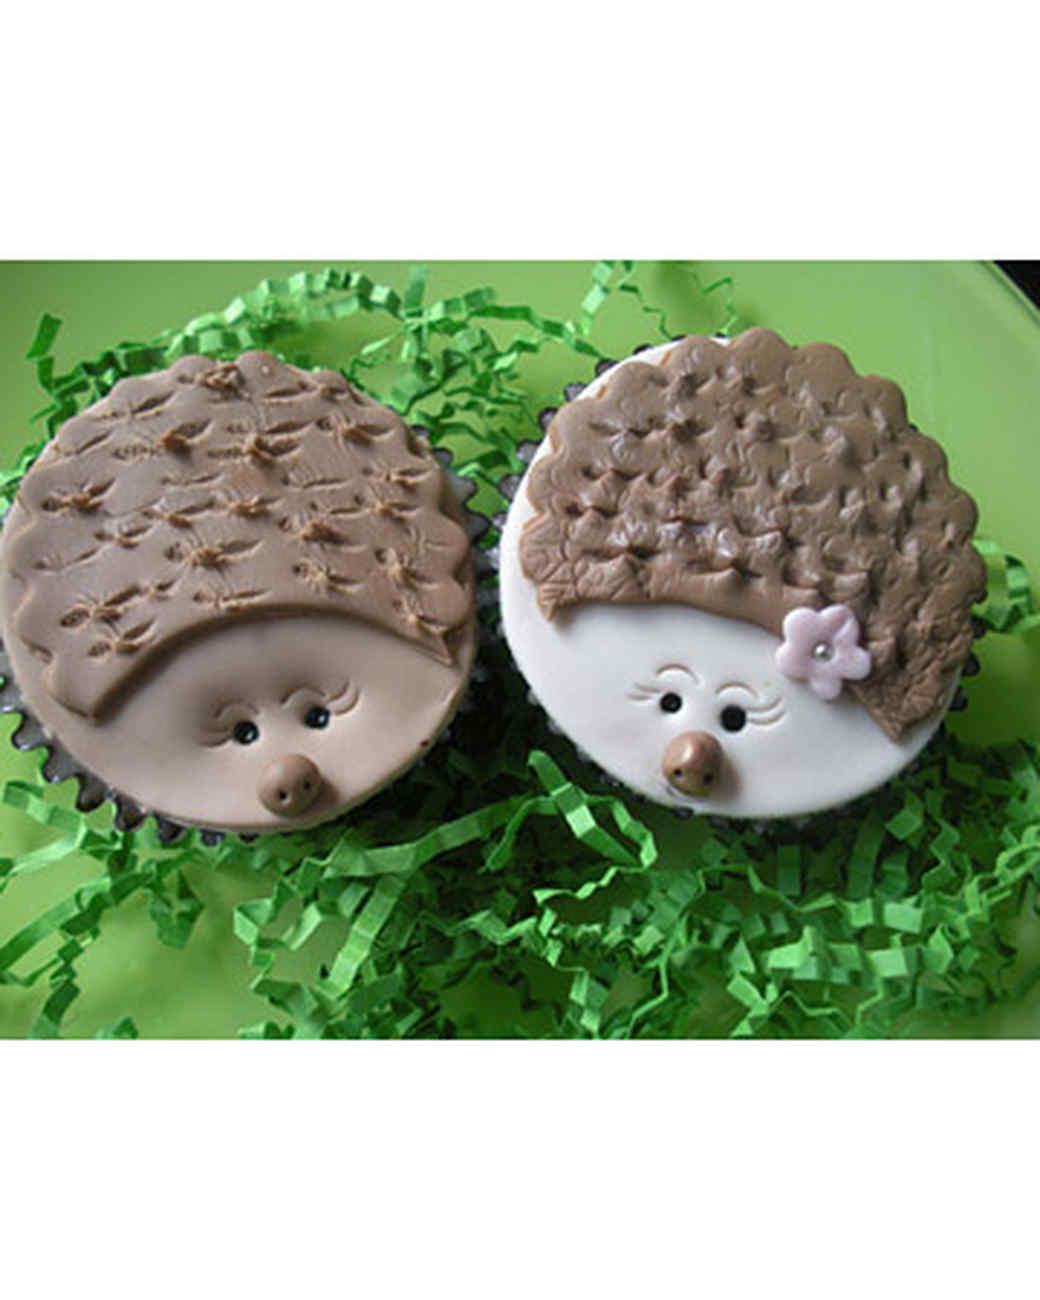 cutestcupcake_hedgehog_dscn3207.jpg